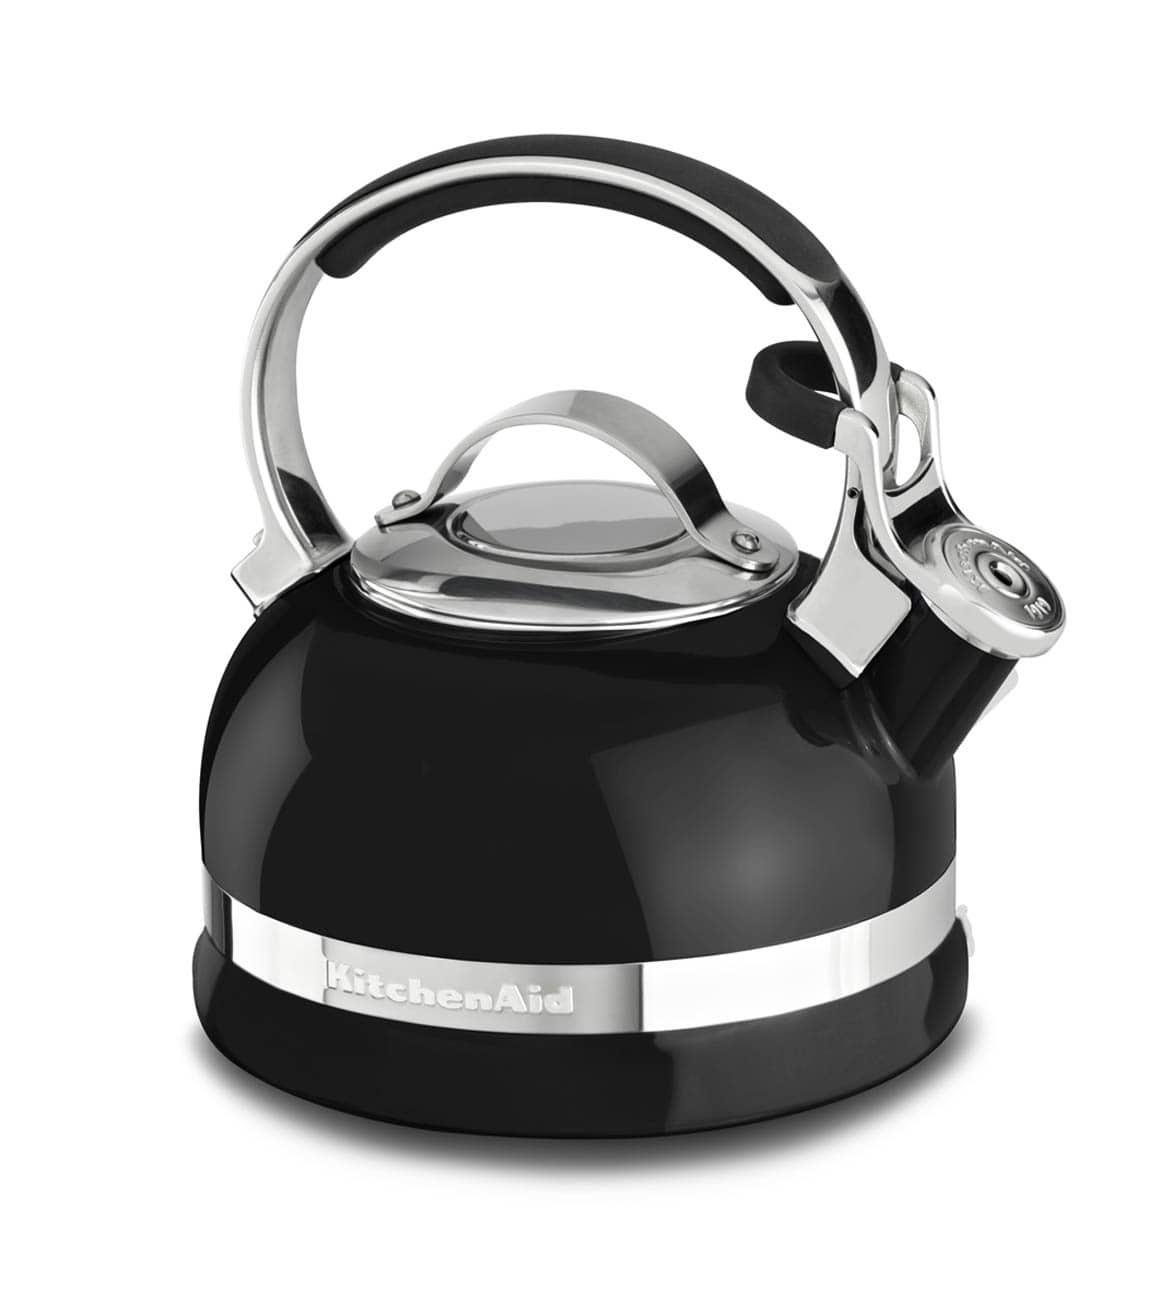 Онлайн каталог PROMENU: Чайник со свистком на плиту KitchenAid, объем 1,89 л, черный                                   KTEN20SBOB